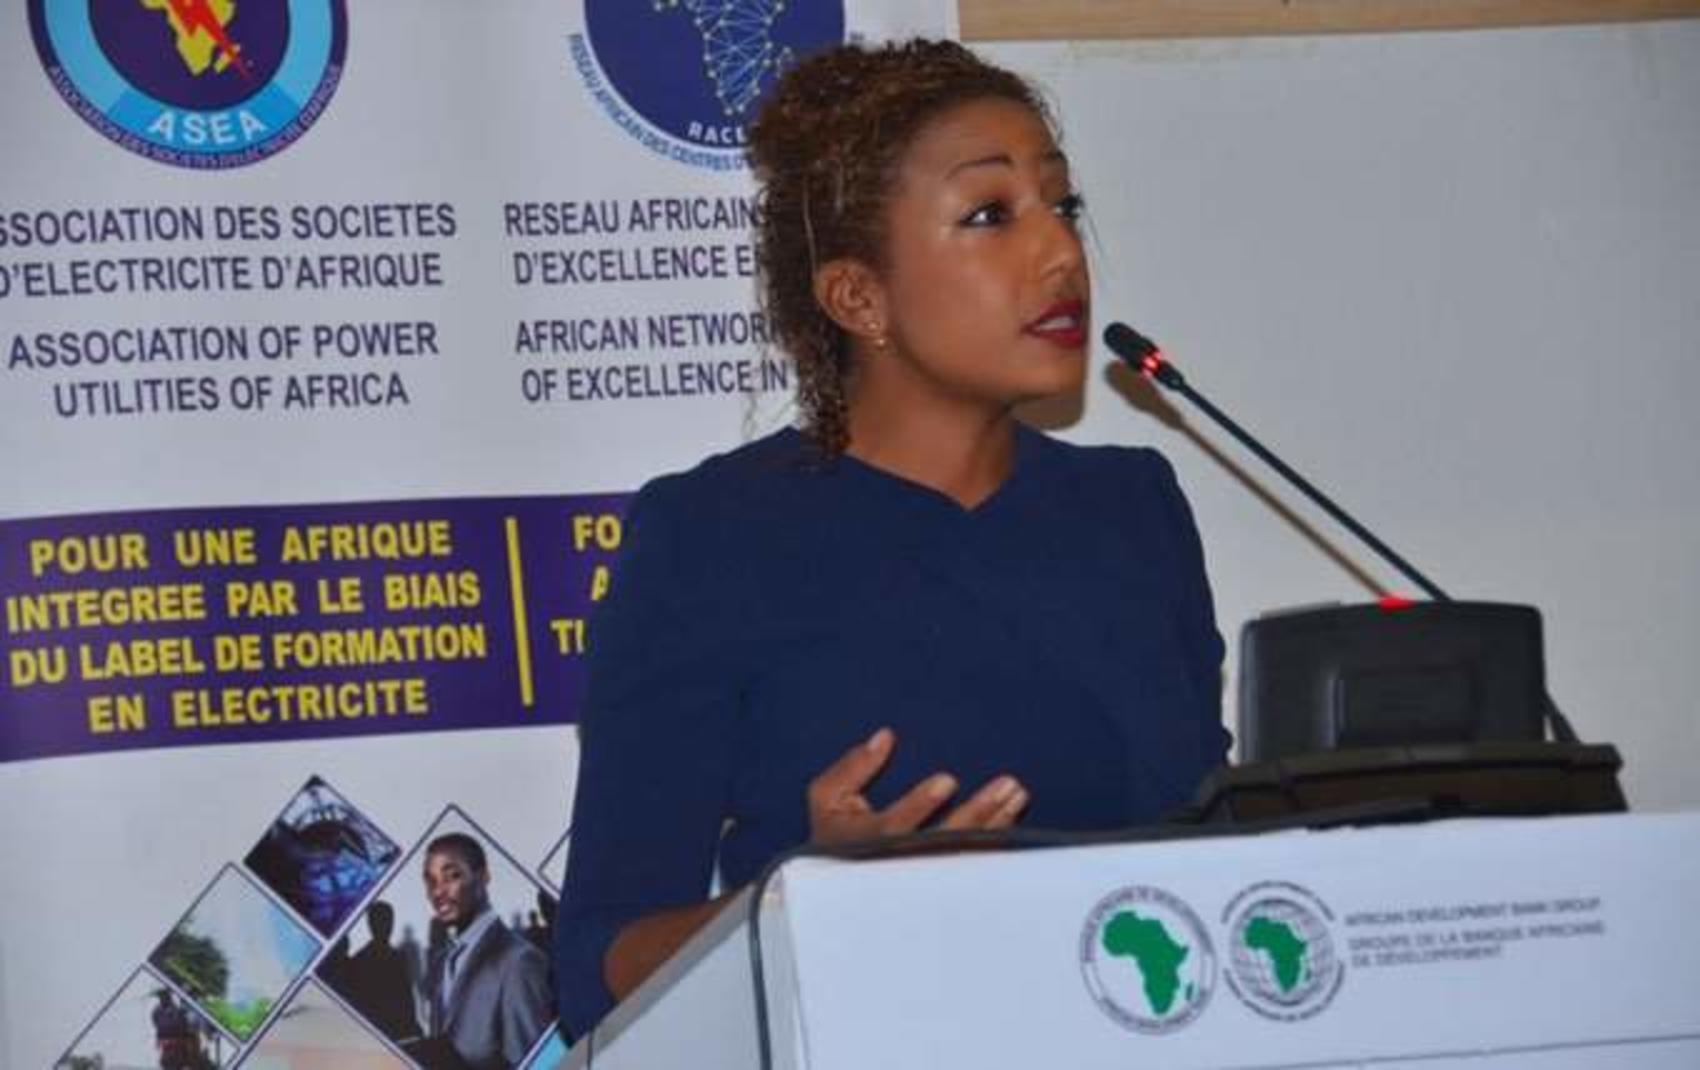 Vanessa Moungar, Director of Gender, Women and Civil Society